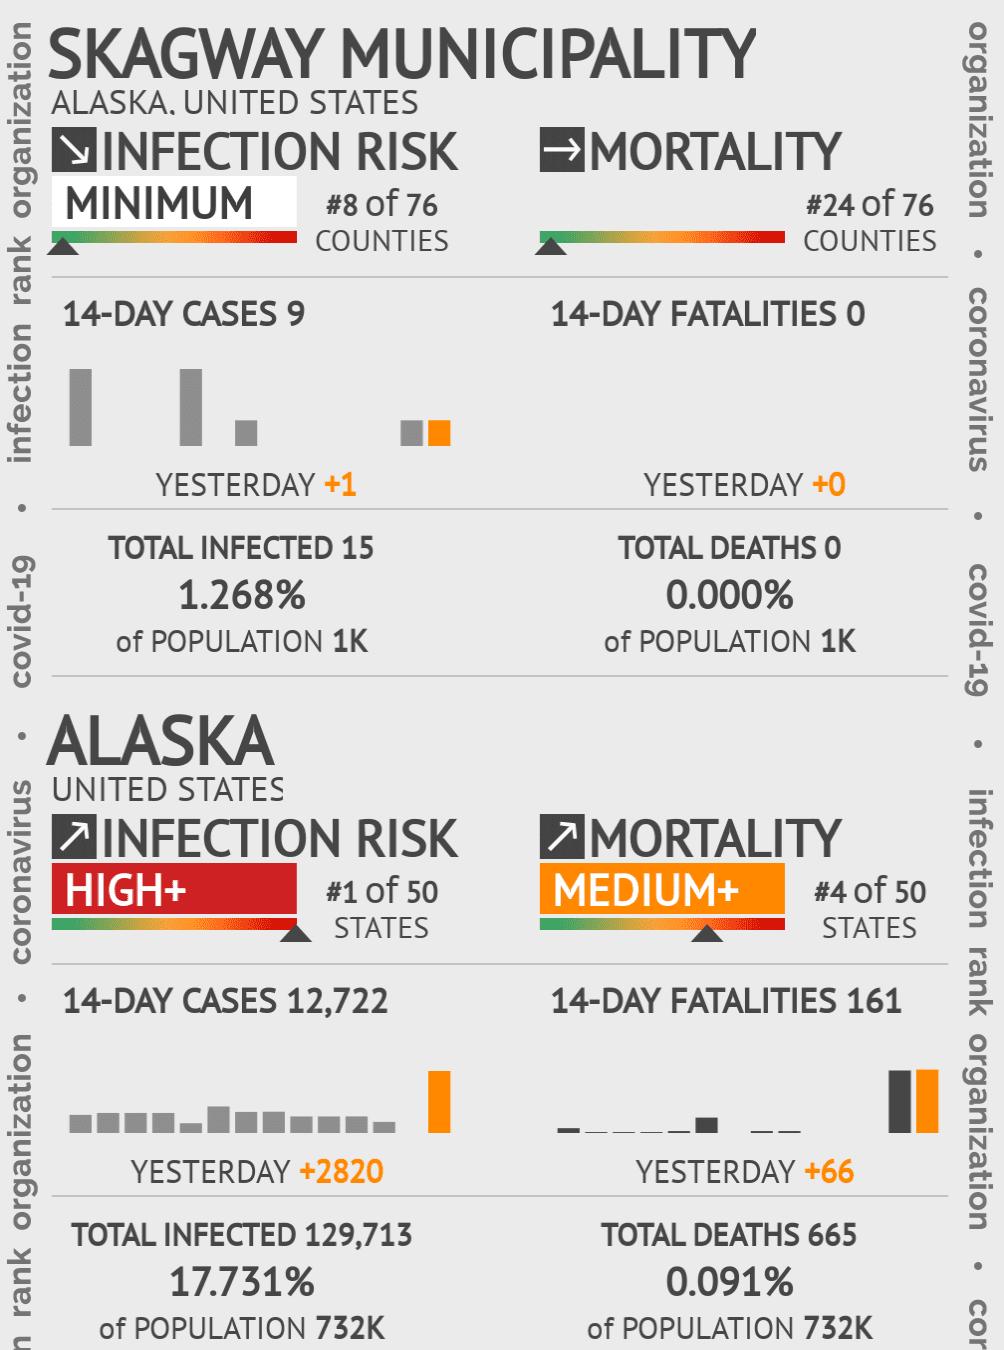 Skagway Municipality Coronavirus Covid-19 Risk of Infection on January 22, 2021